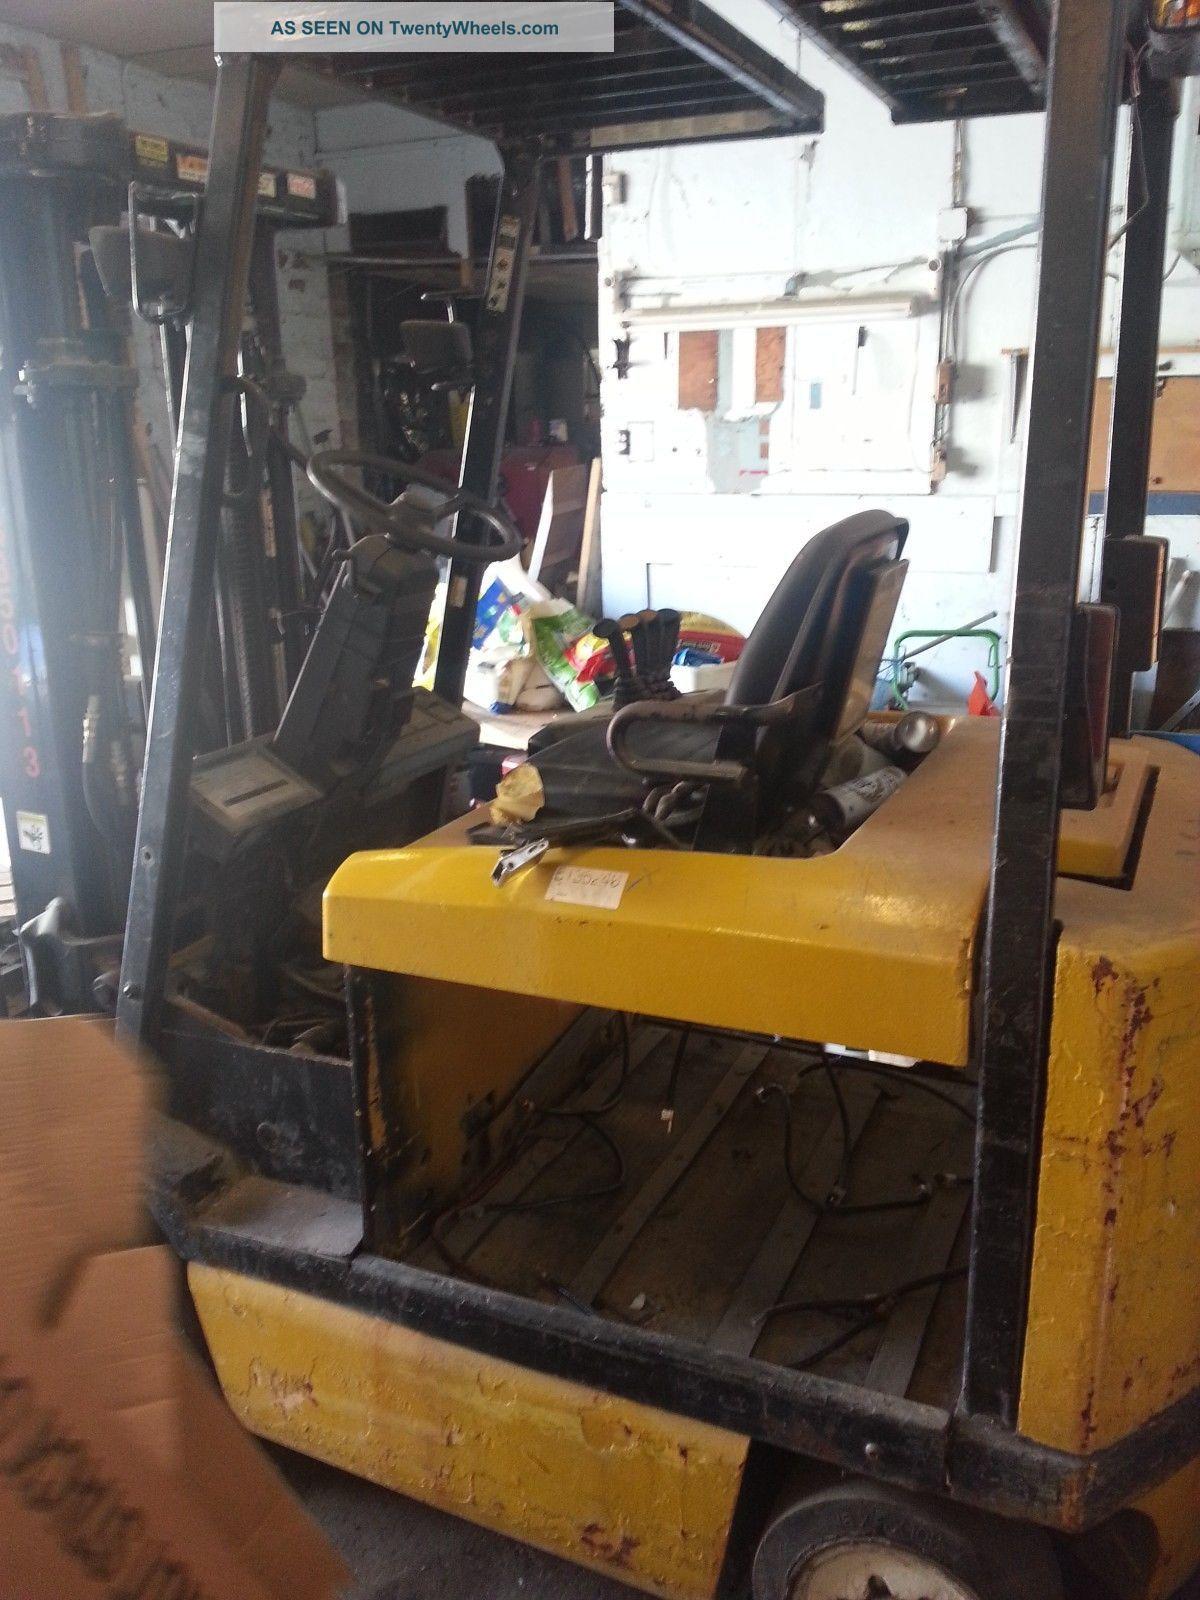 Four Way Side Loader Forklift Mitsubishi Rbm2025k Series: Yale Erc060 Electric Forklift 4800 No Battery Side Shift